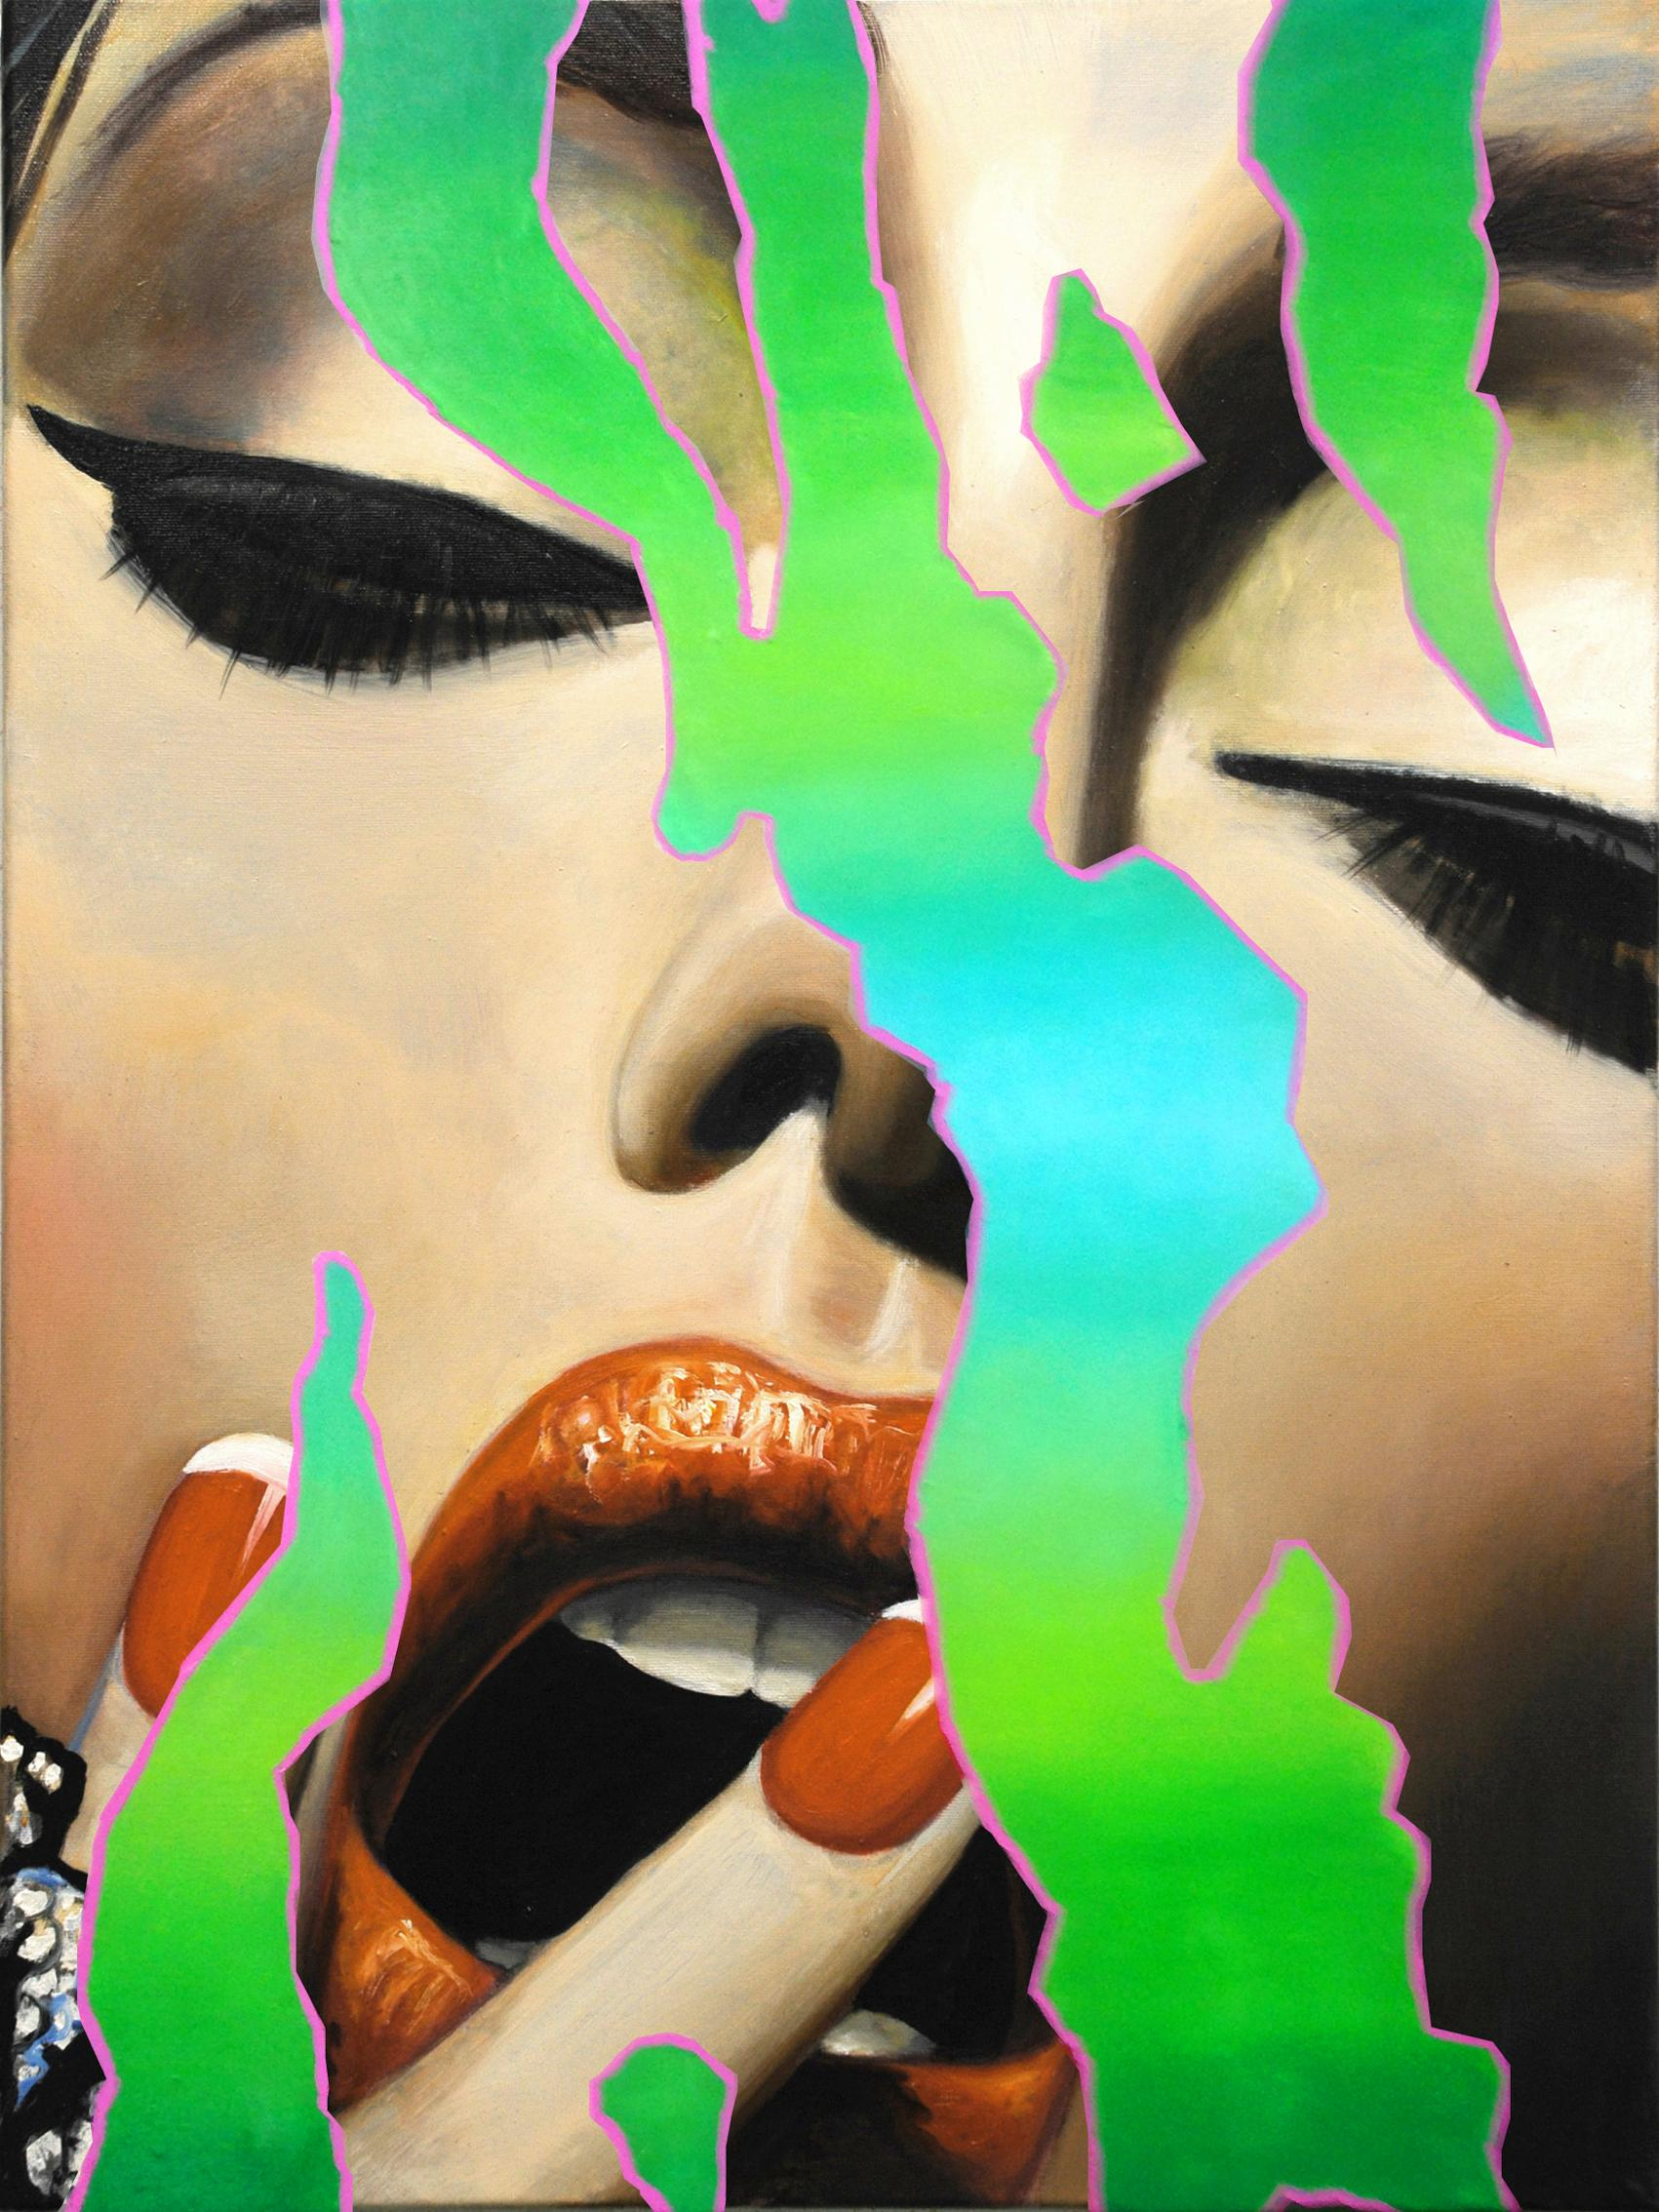 Glossy 1 - Contemporary, Pop Art, figurative, modern, female Portrait, oilpaint